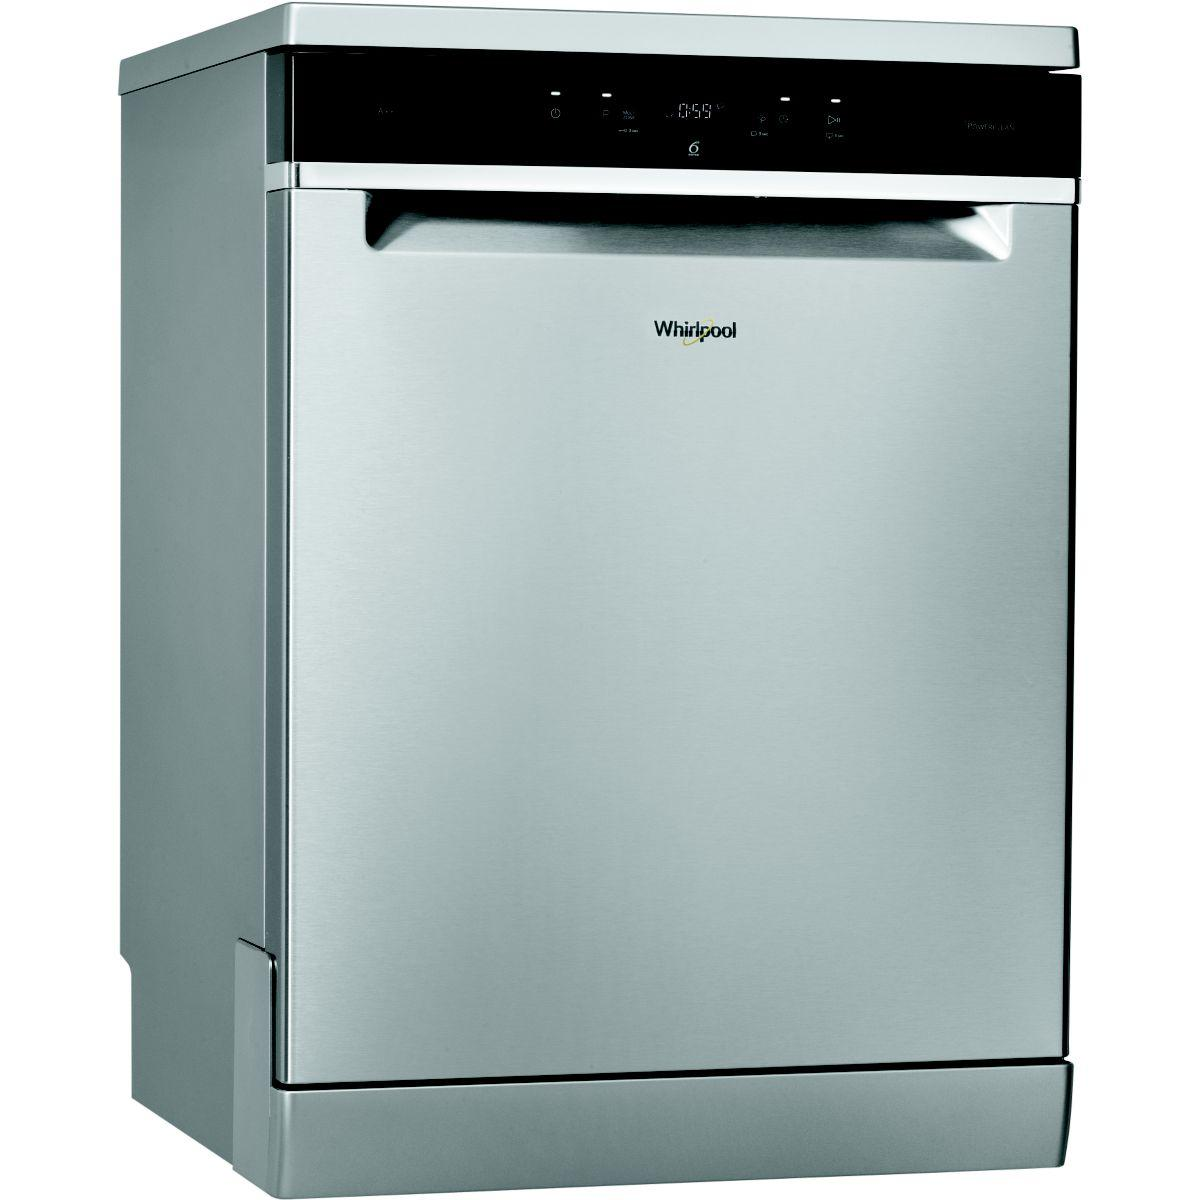 Lave vaisselle 60 cm WHIRLPOOL WFC 3C26PX Inox